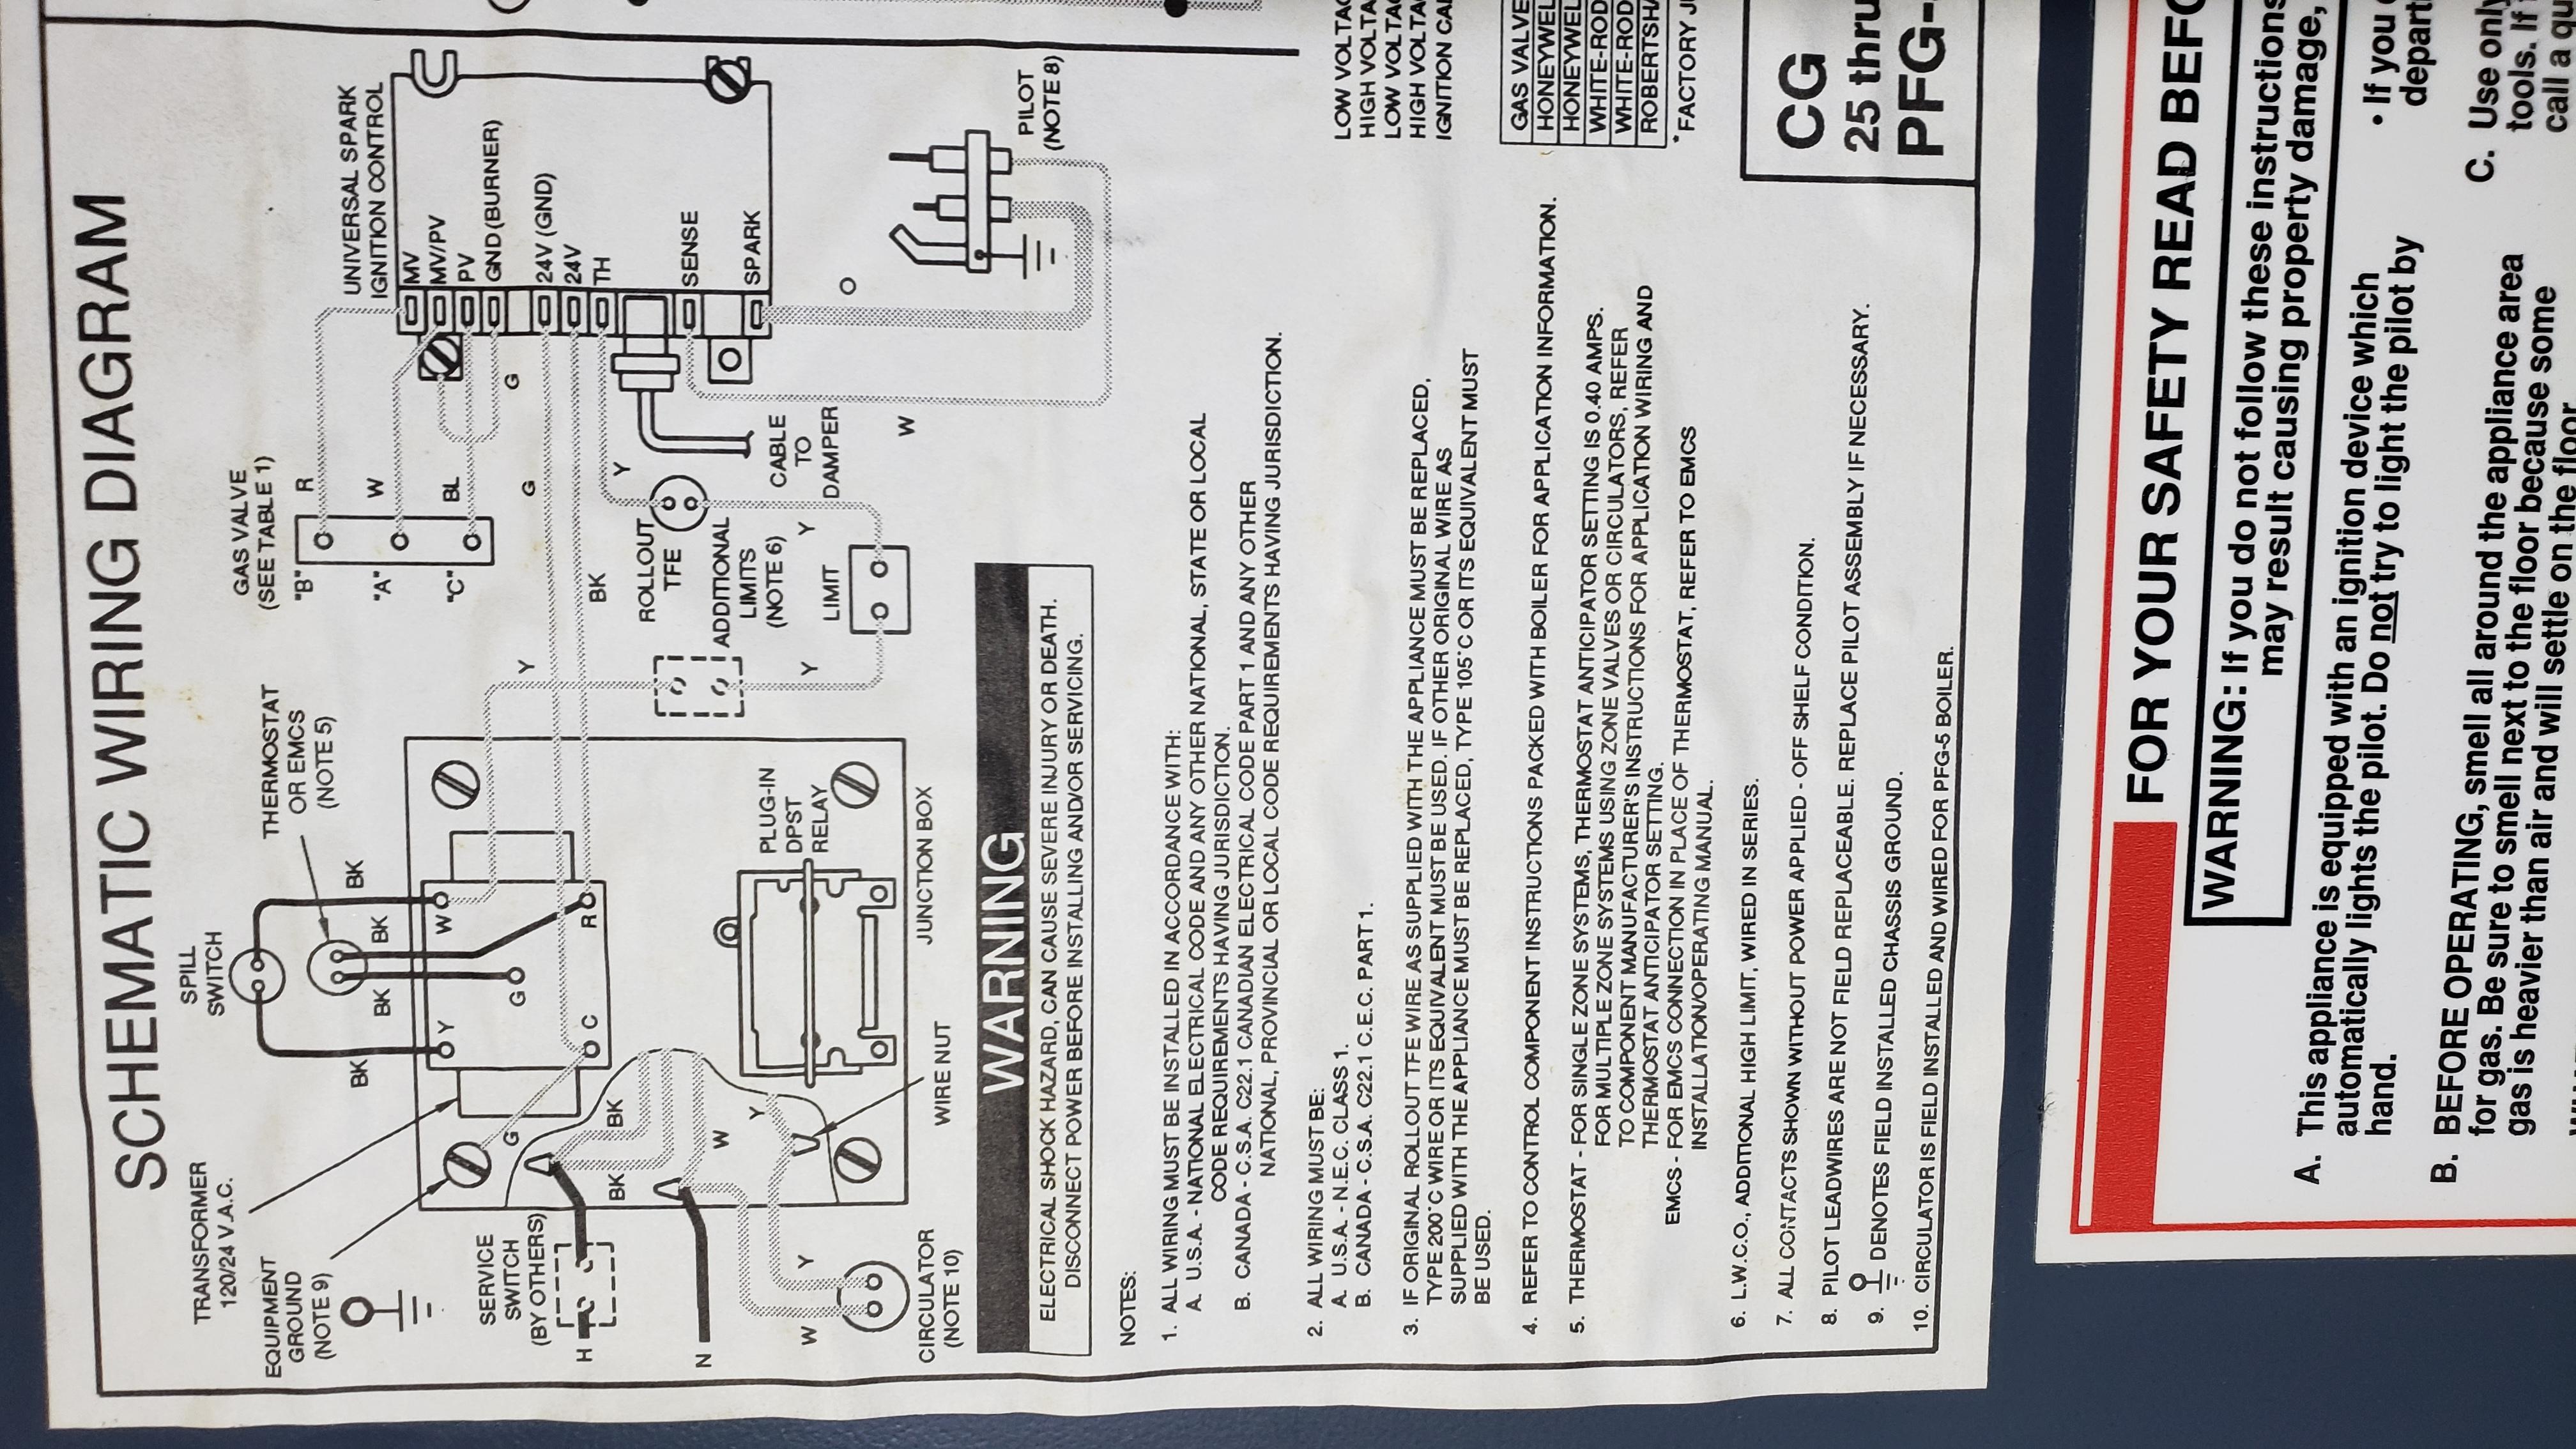 My ignition module in my Well McLain CG furnace keeps failing ... on